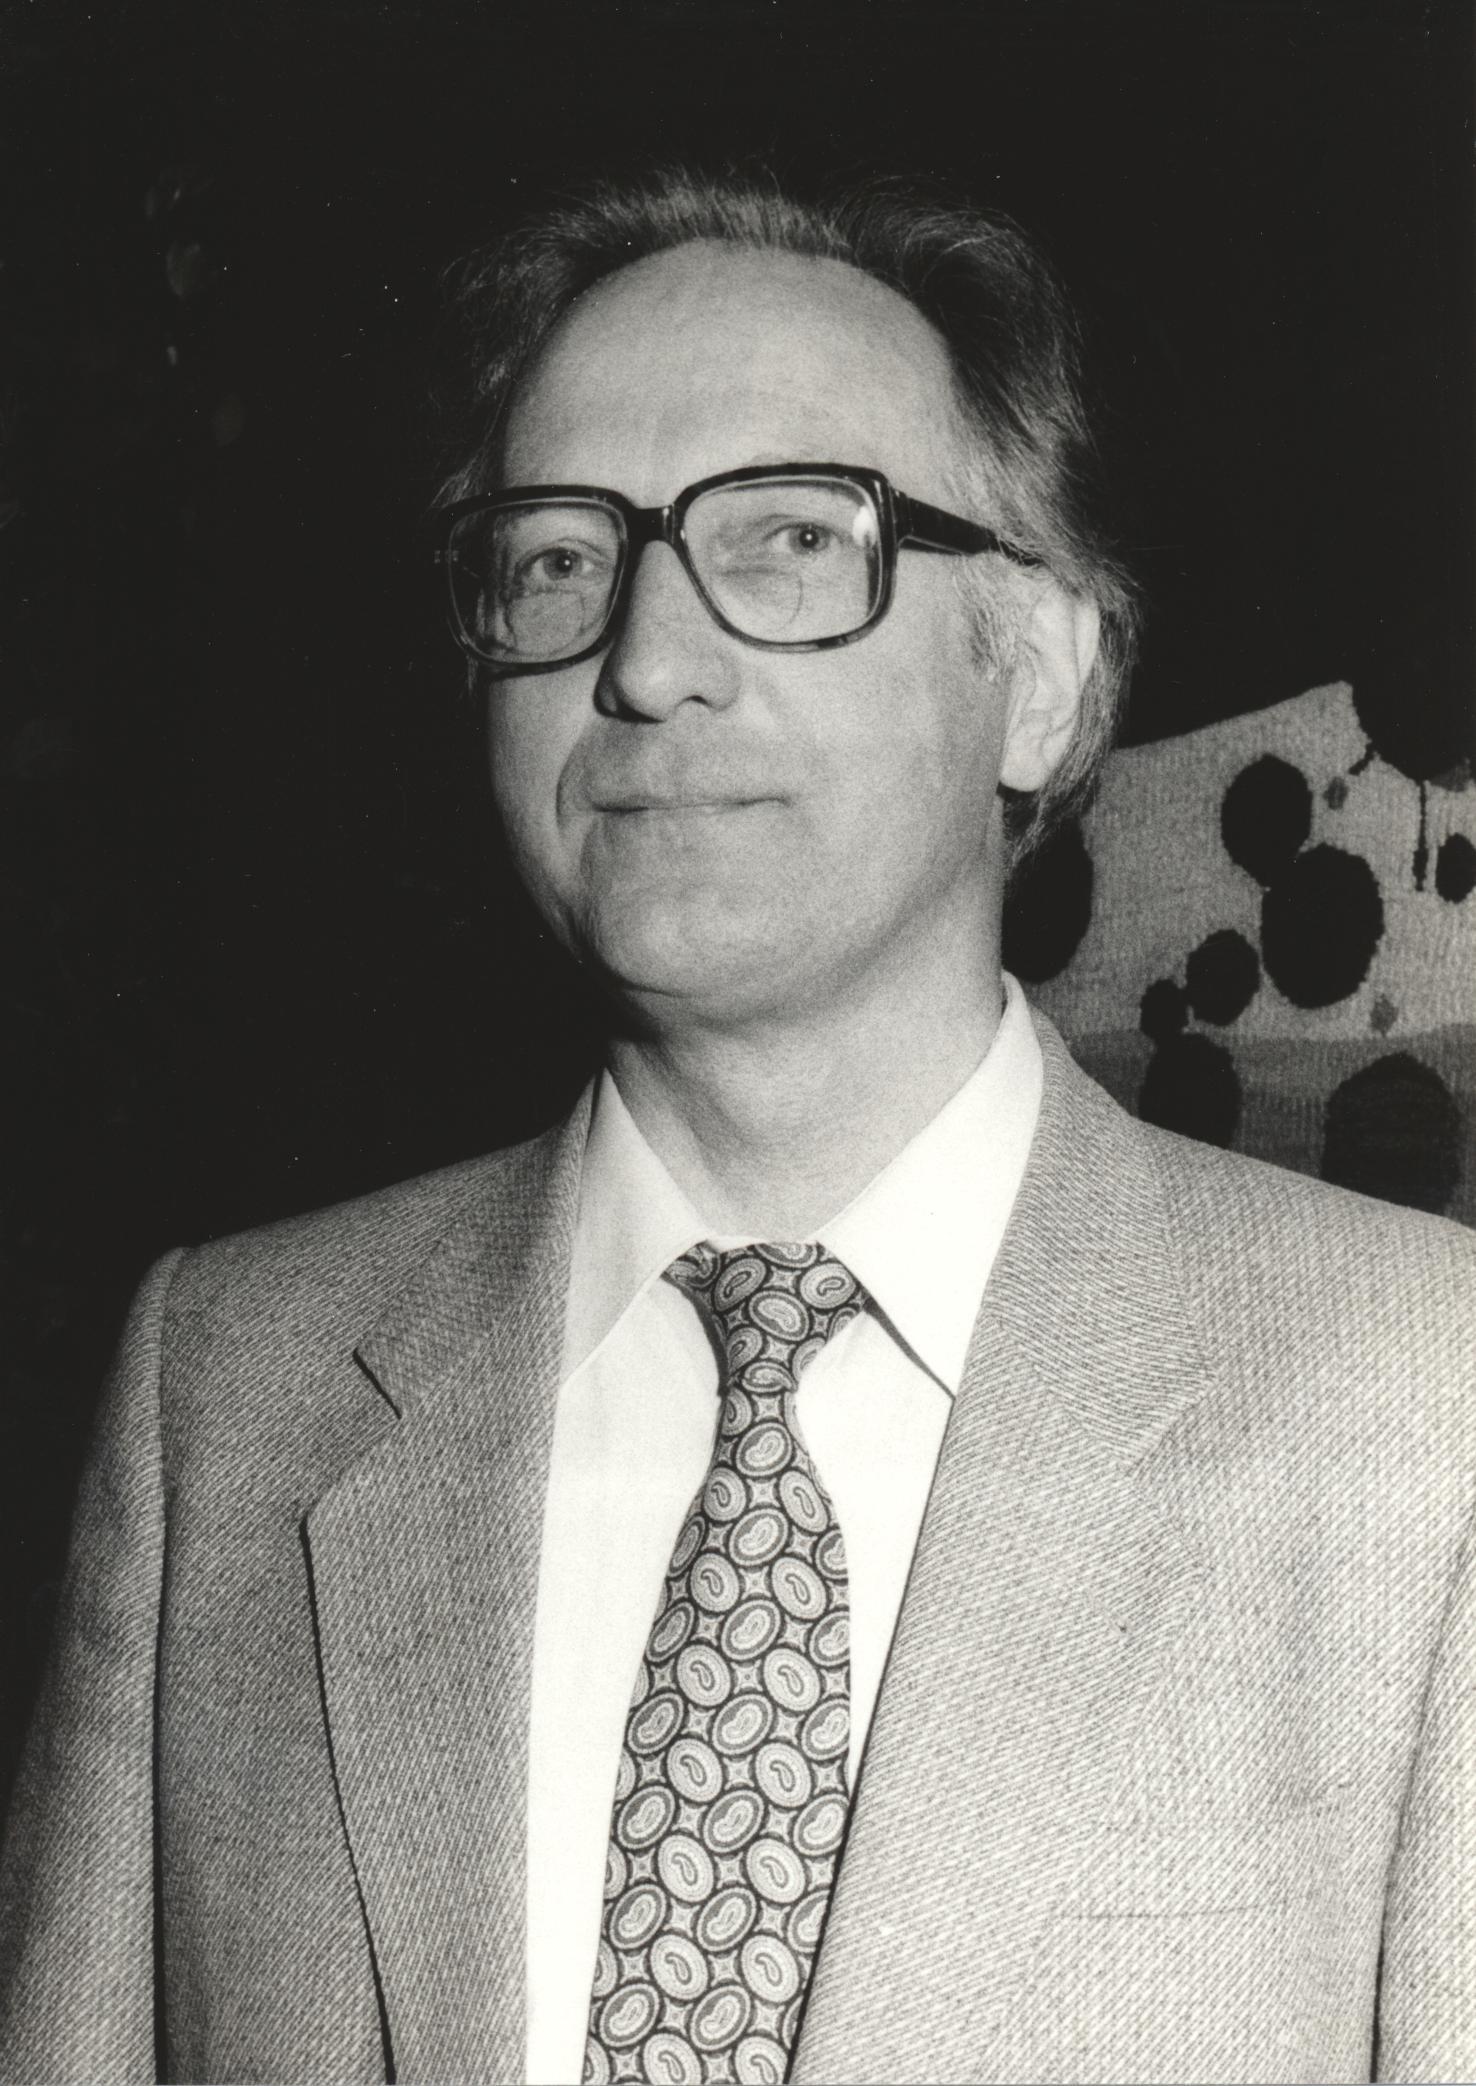 XIII. Imago Mundi-Kongress 1991, Innsbruck, Prof. Dr. Erlendur Haraldsson